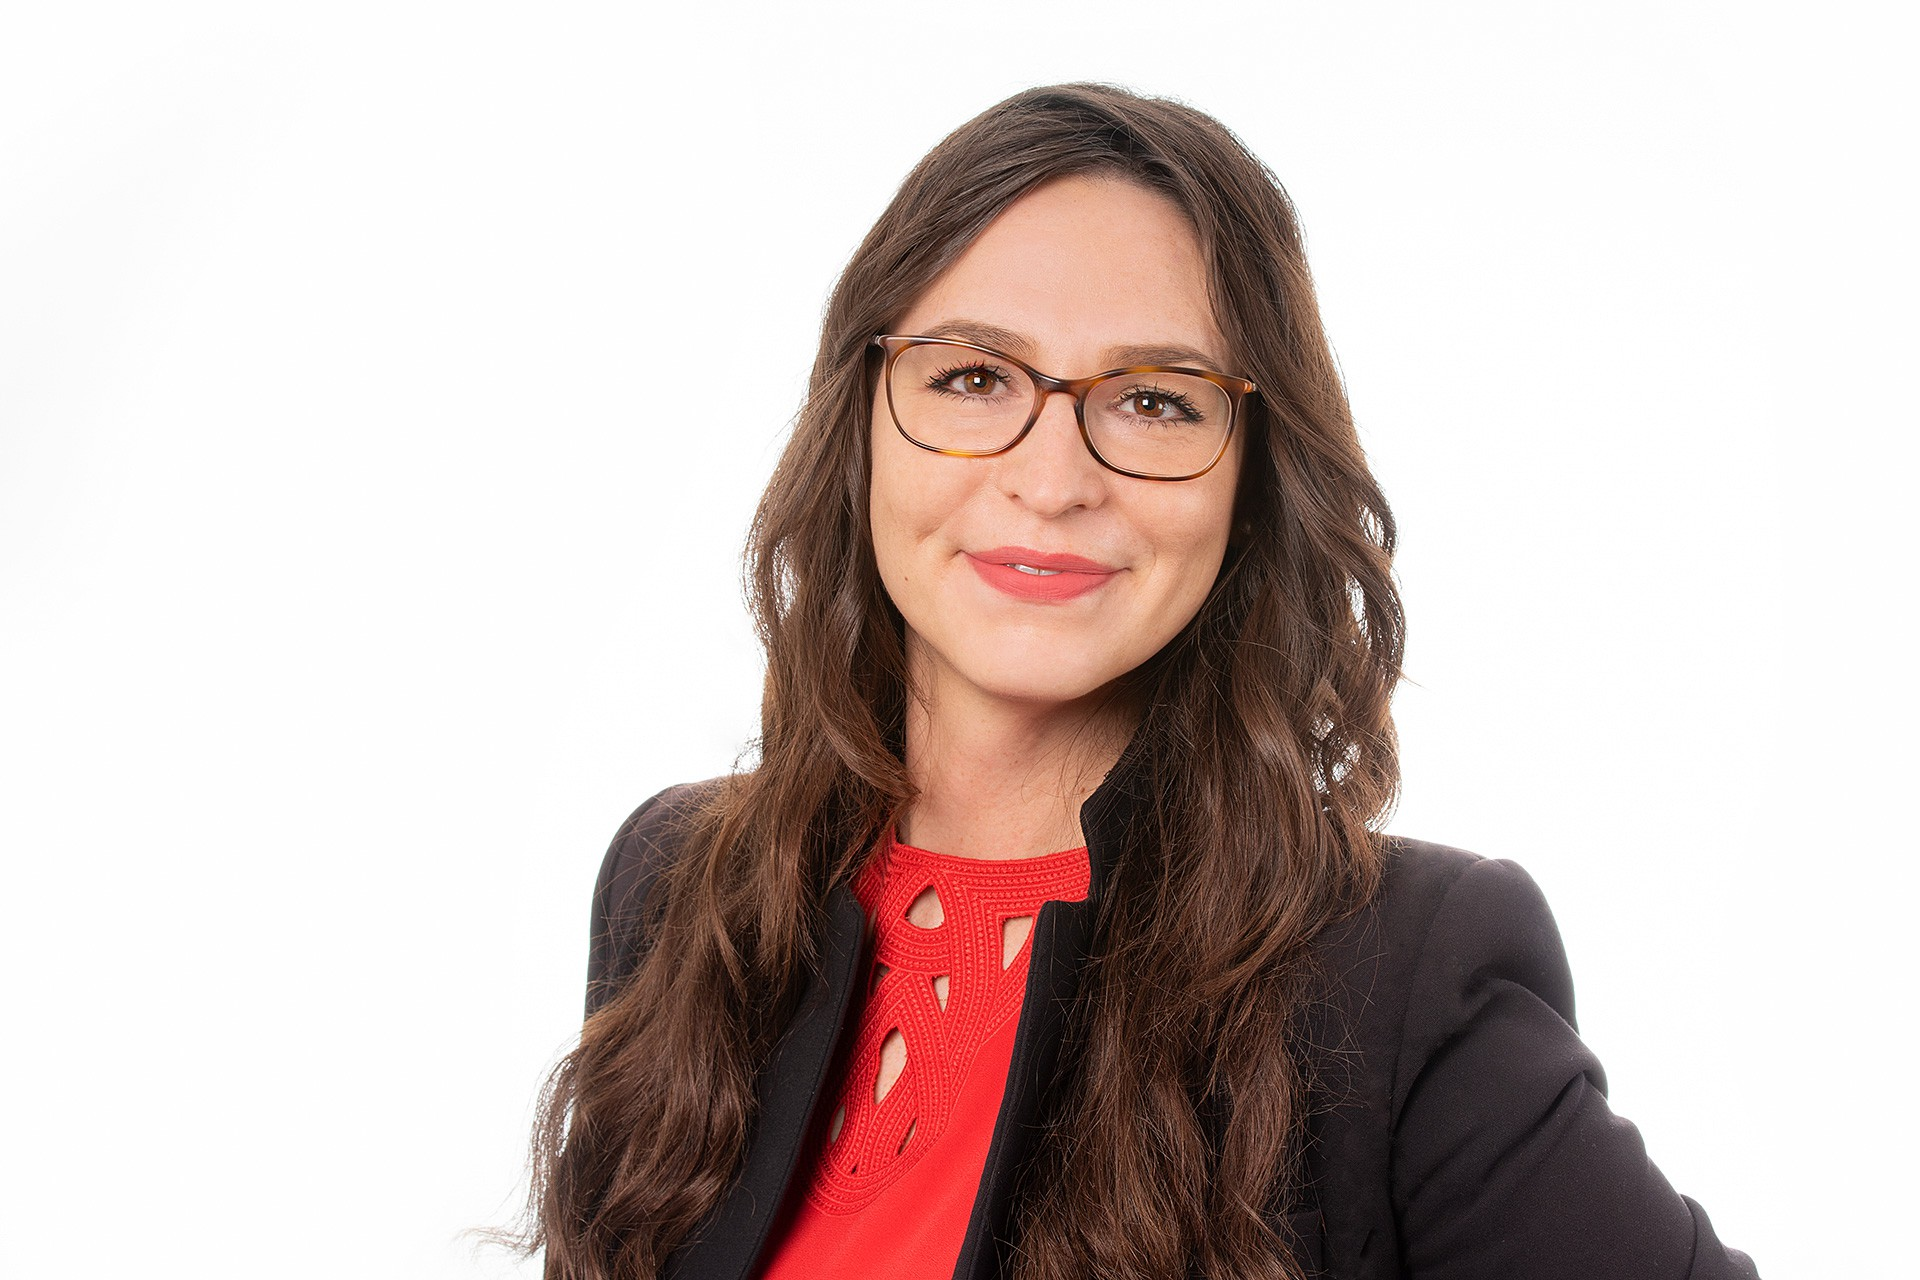 Portrait: Kristina Fast - tibb Kinder- und Jugendhilfe